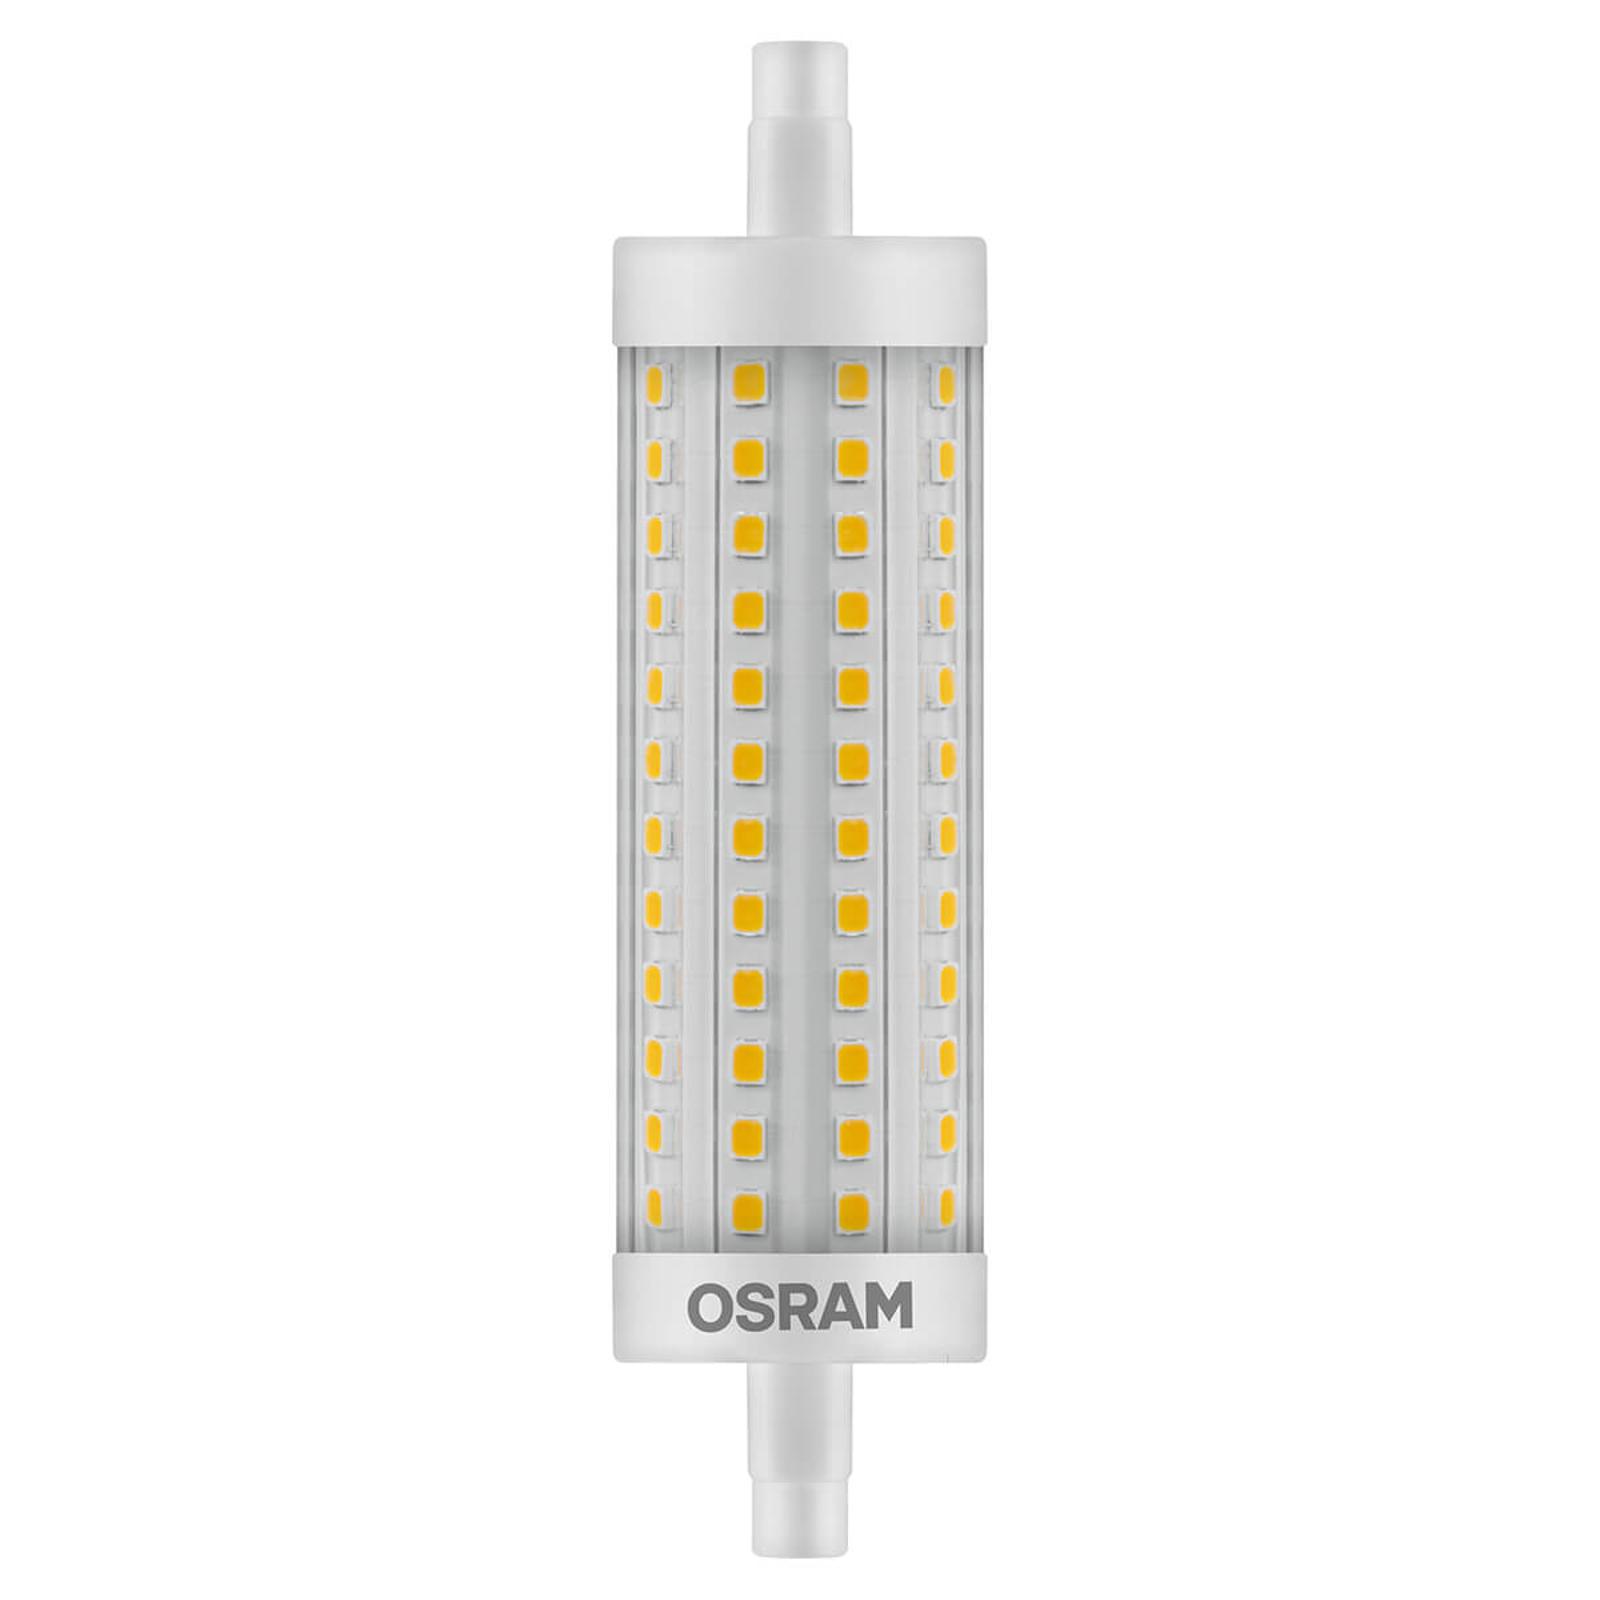 OSRAM LED-Stablampe R7s 15W 11,8cm 827 dimmbar